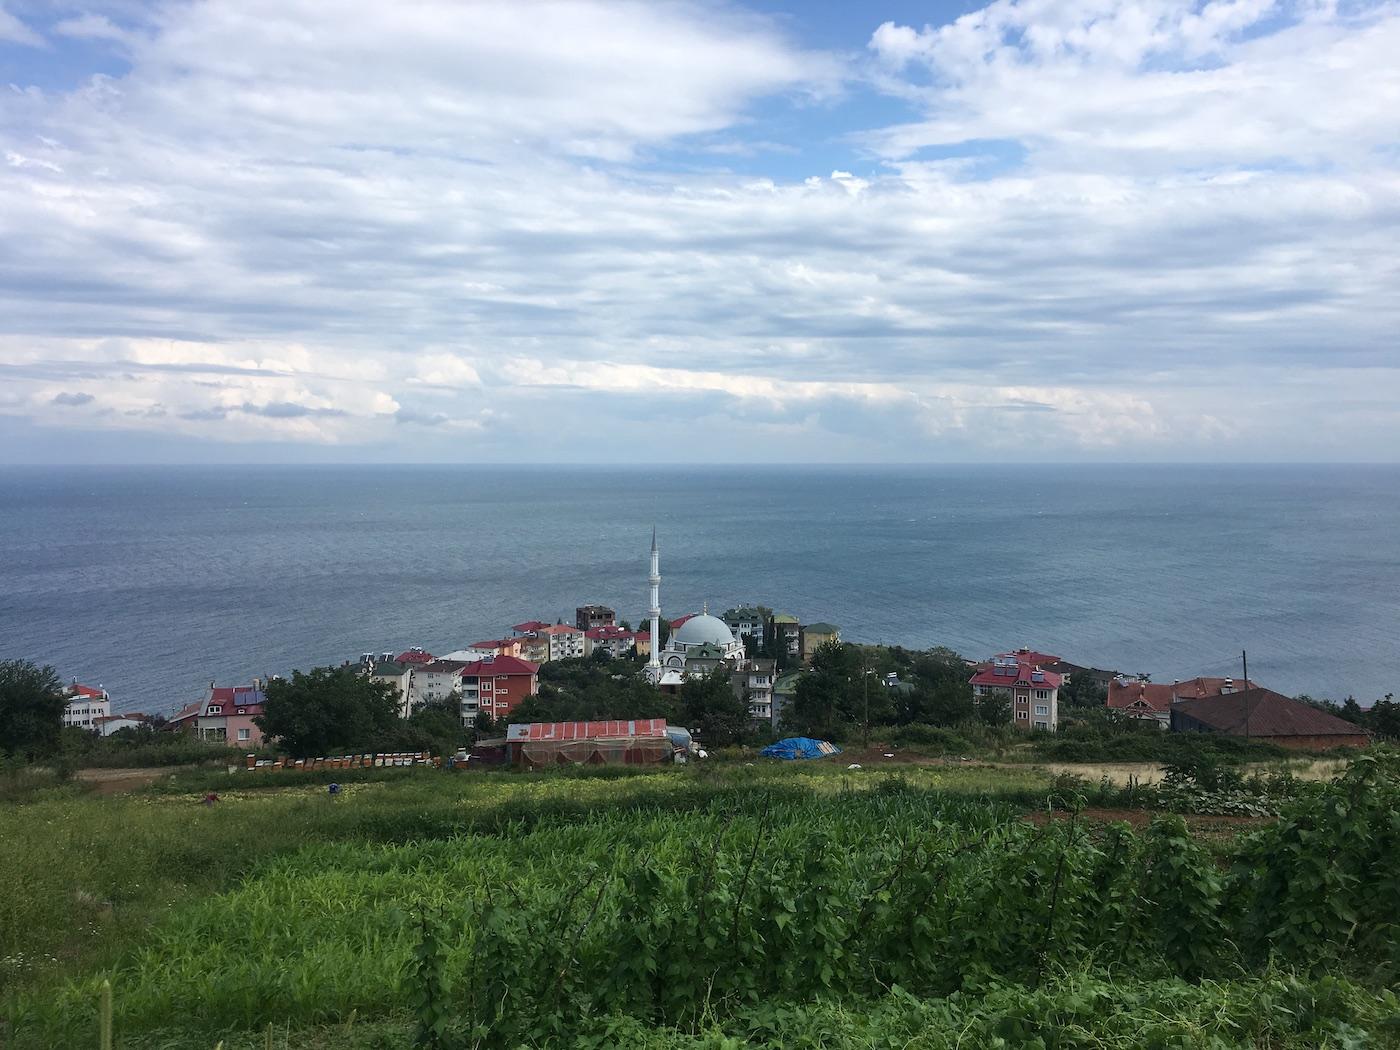 Orada Bir Köy Var Uzakta: TaTuTa